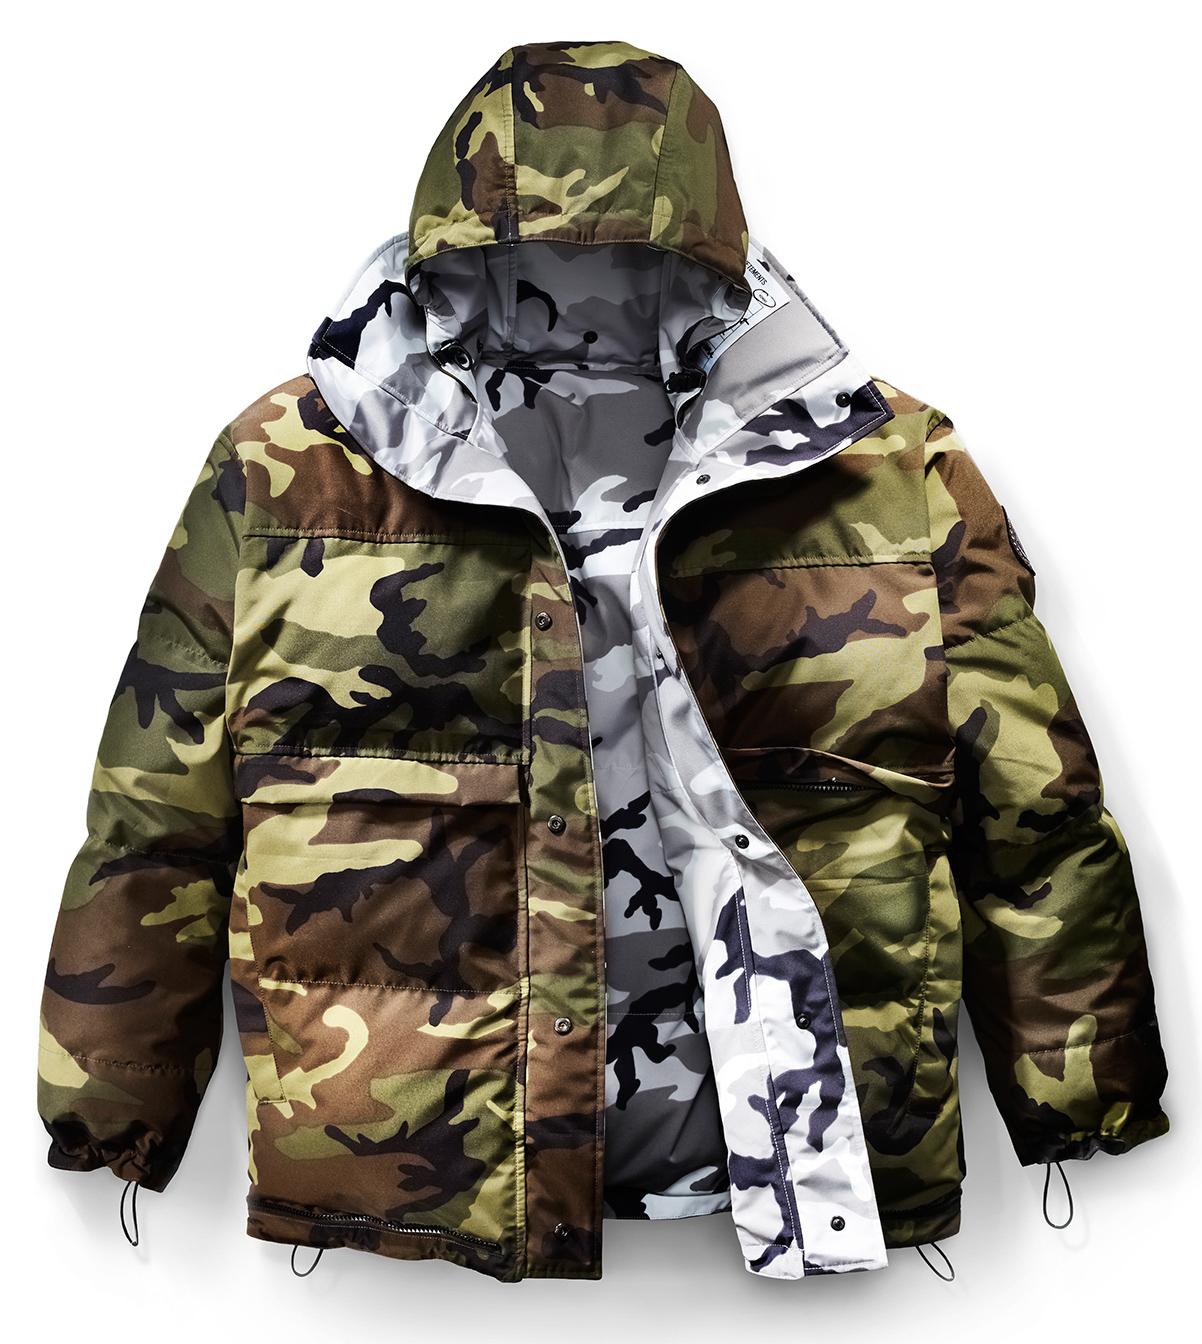 Canada Good X Vetements military collaboration jacket